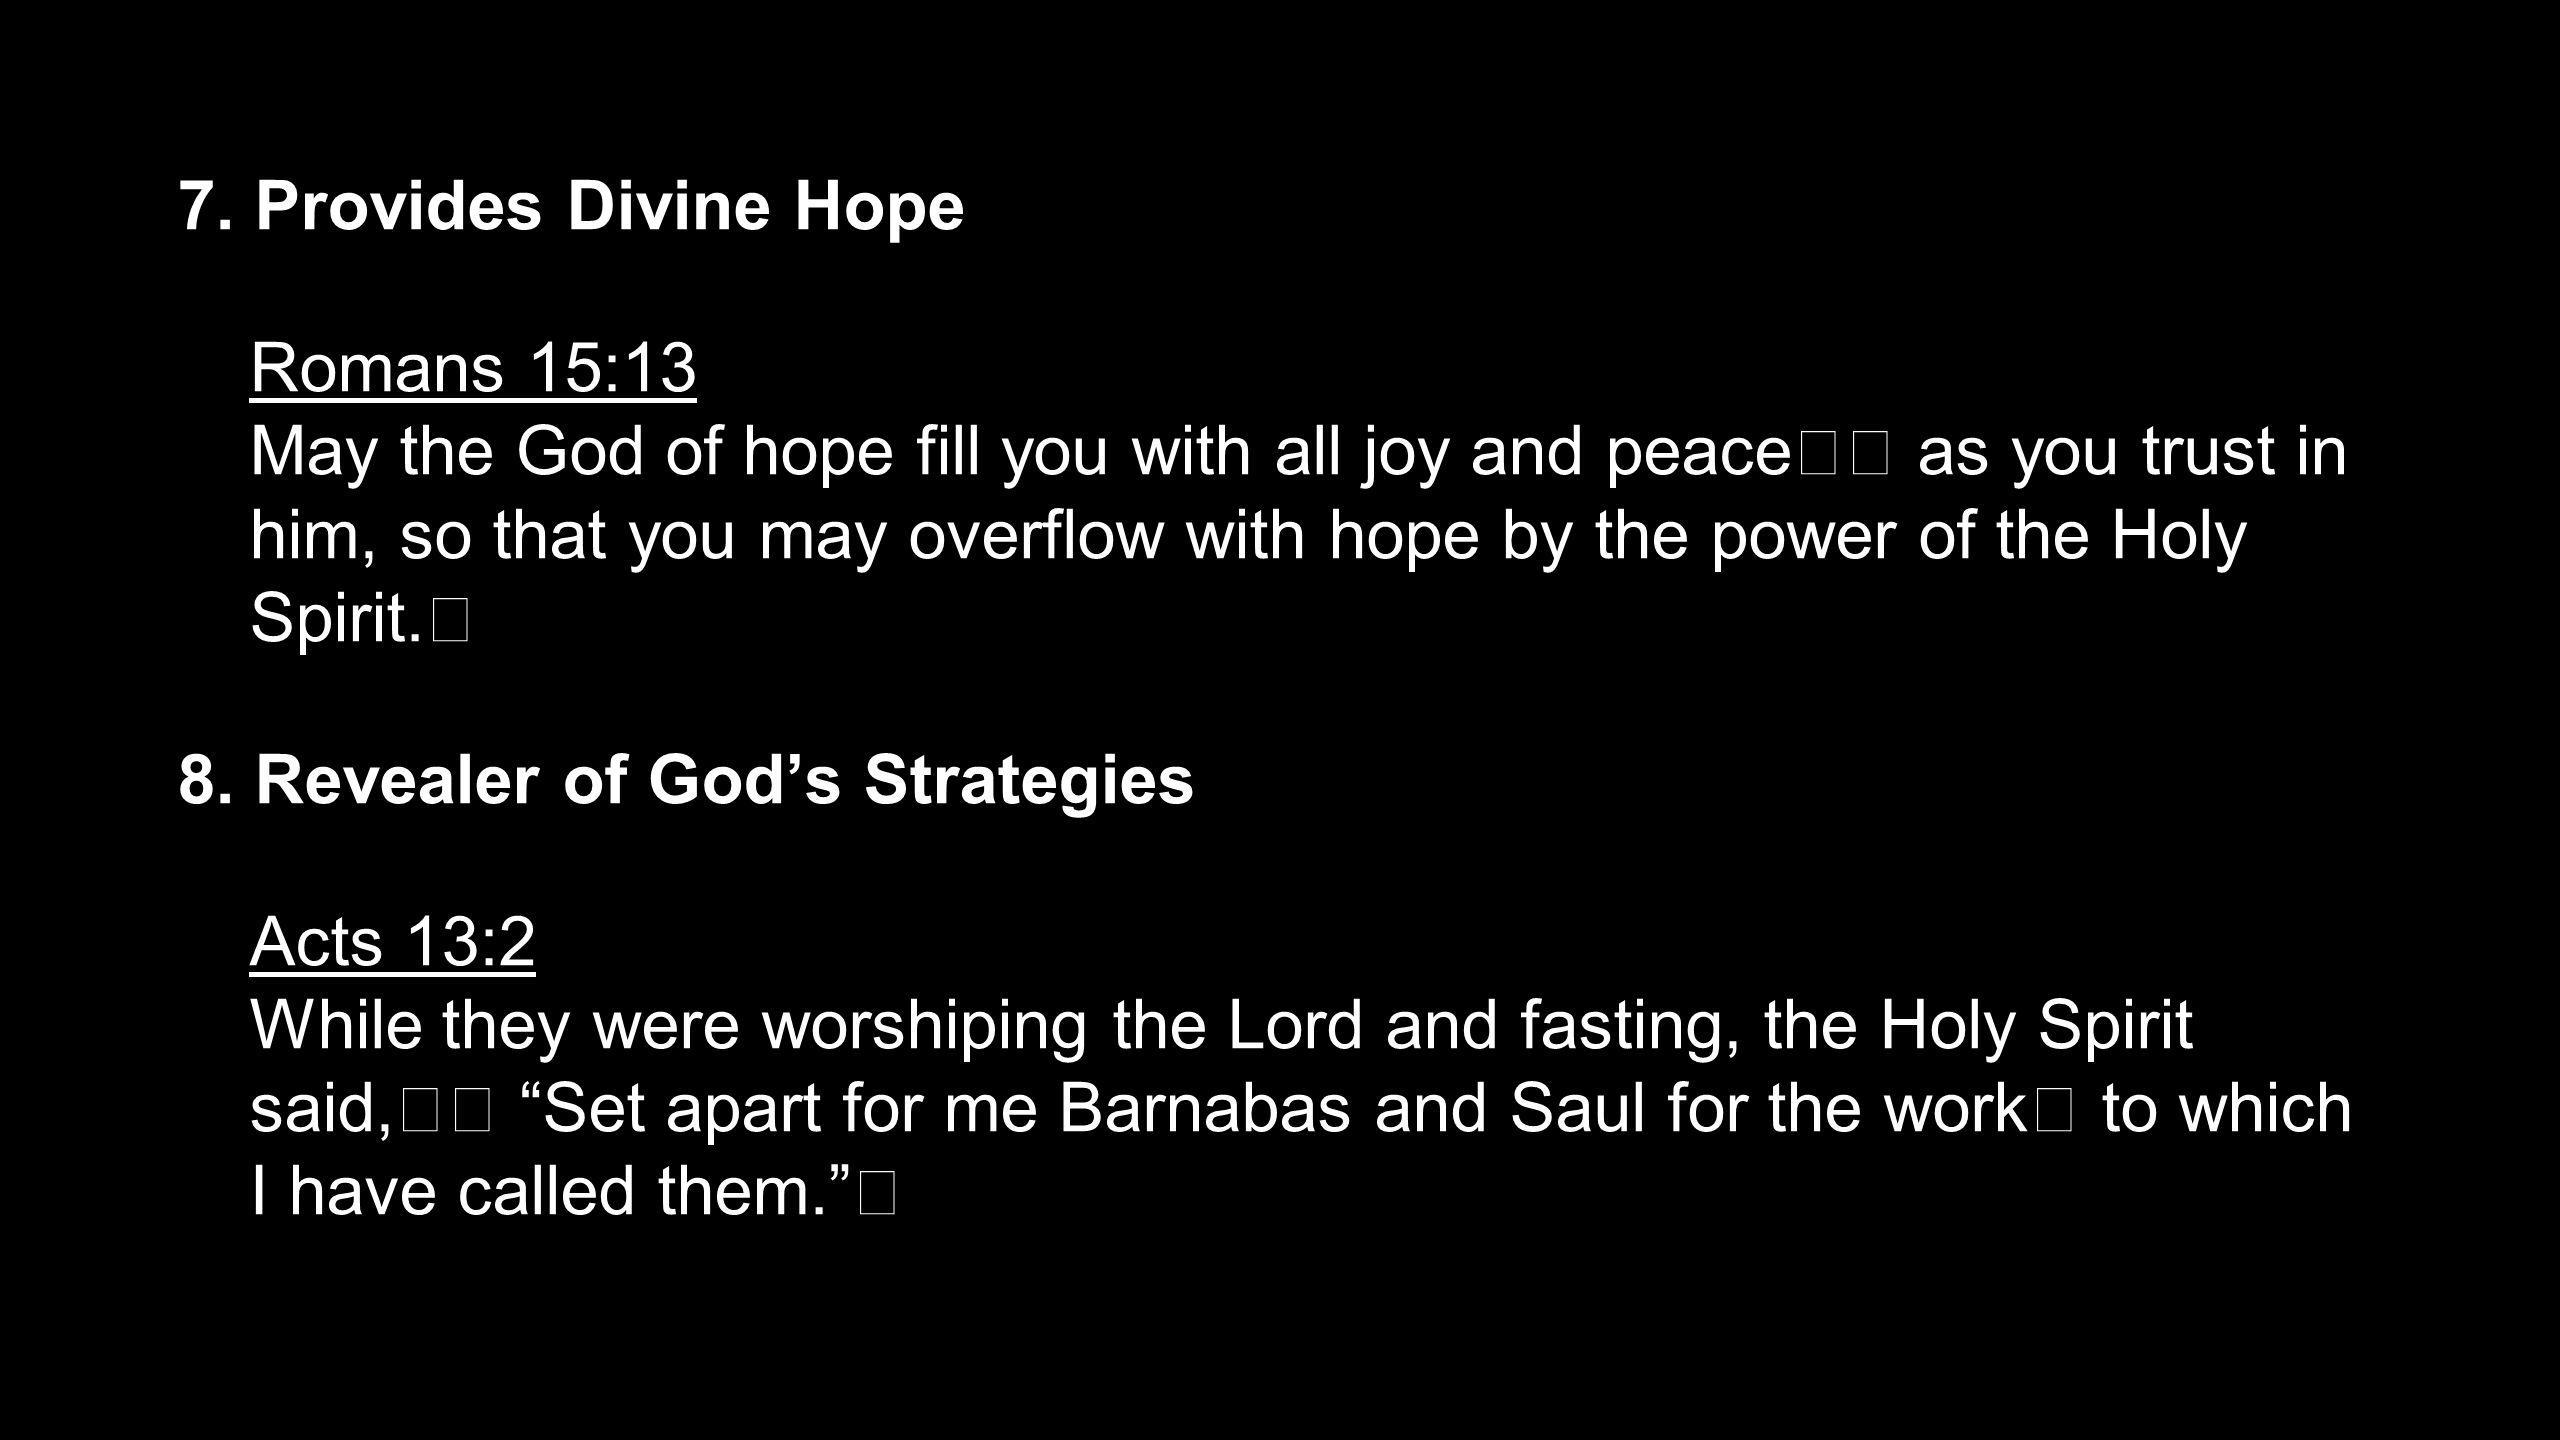 7. Provides Divine Hope